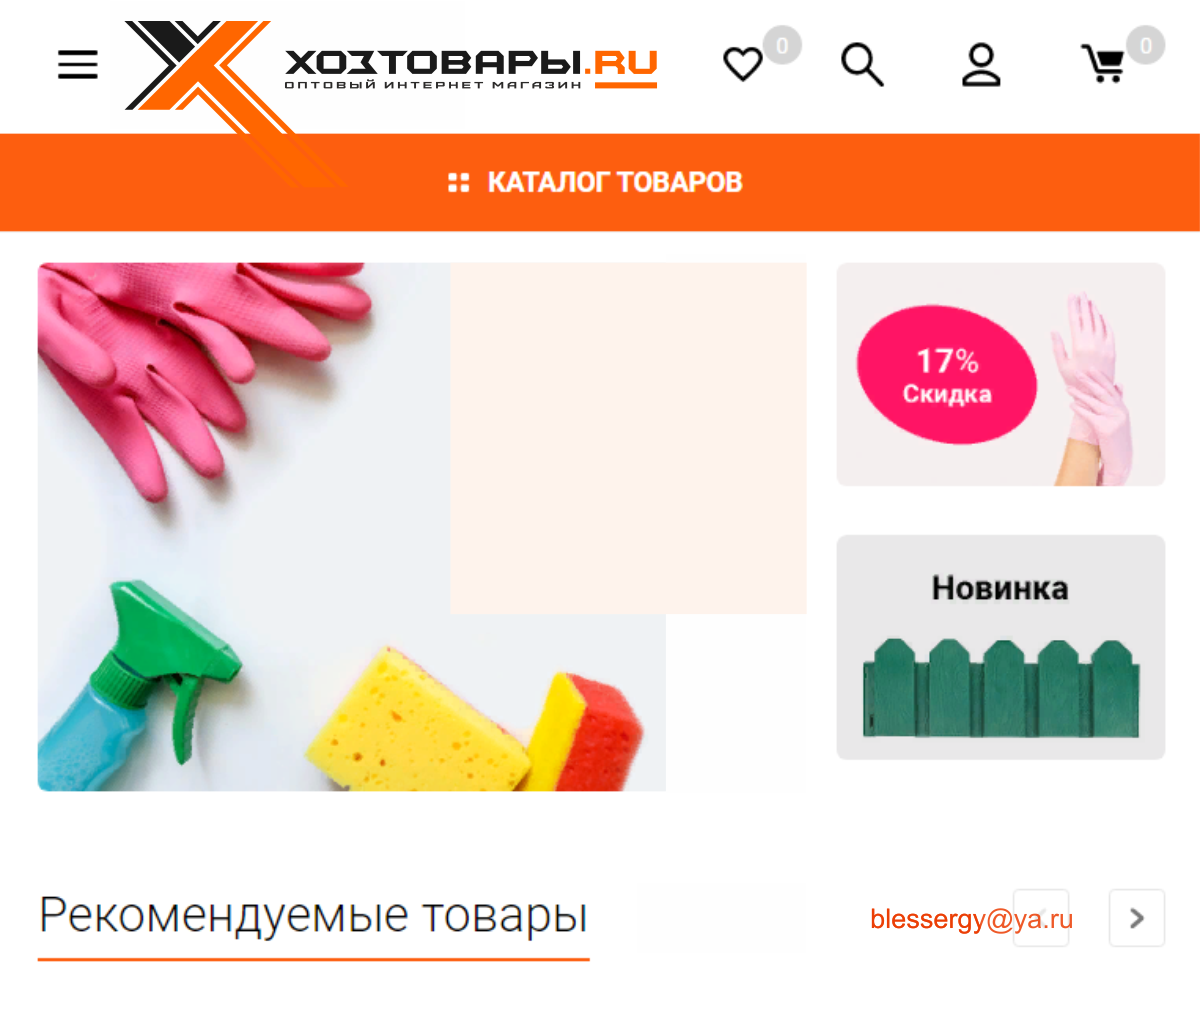 Разработка логотипа для оптового интернет-магазина «Хозтовары.ру» фото f_810606e7a73943e1.png